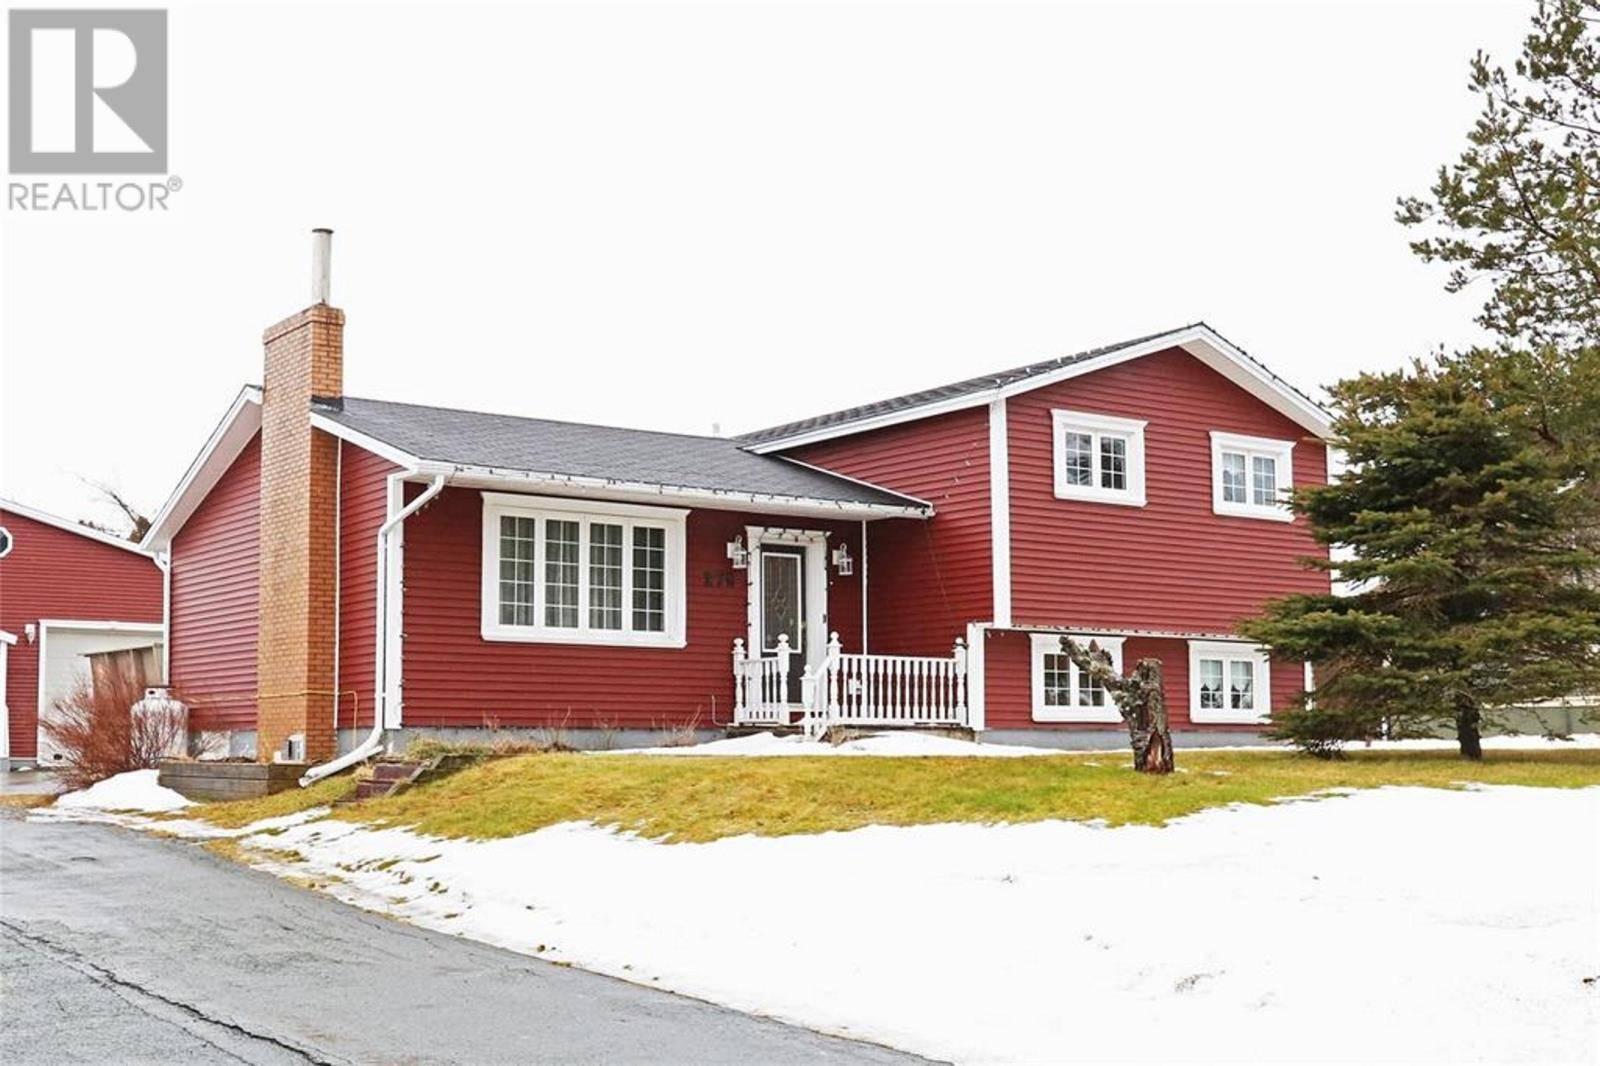 House for sale at 279 Indian Meal Line Torbay Newfoundland - MLS: 1211715